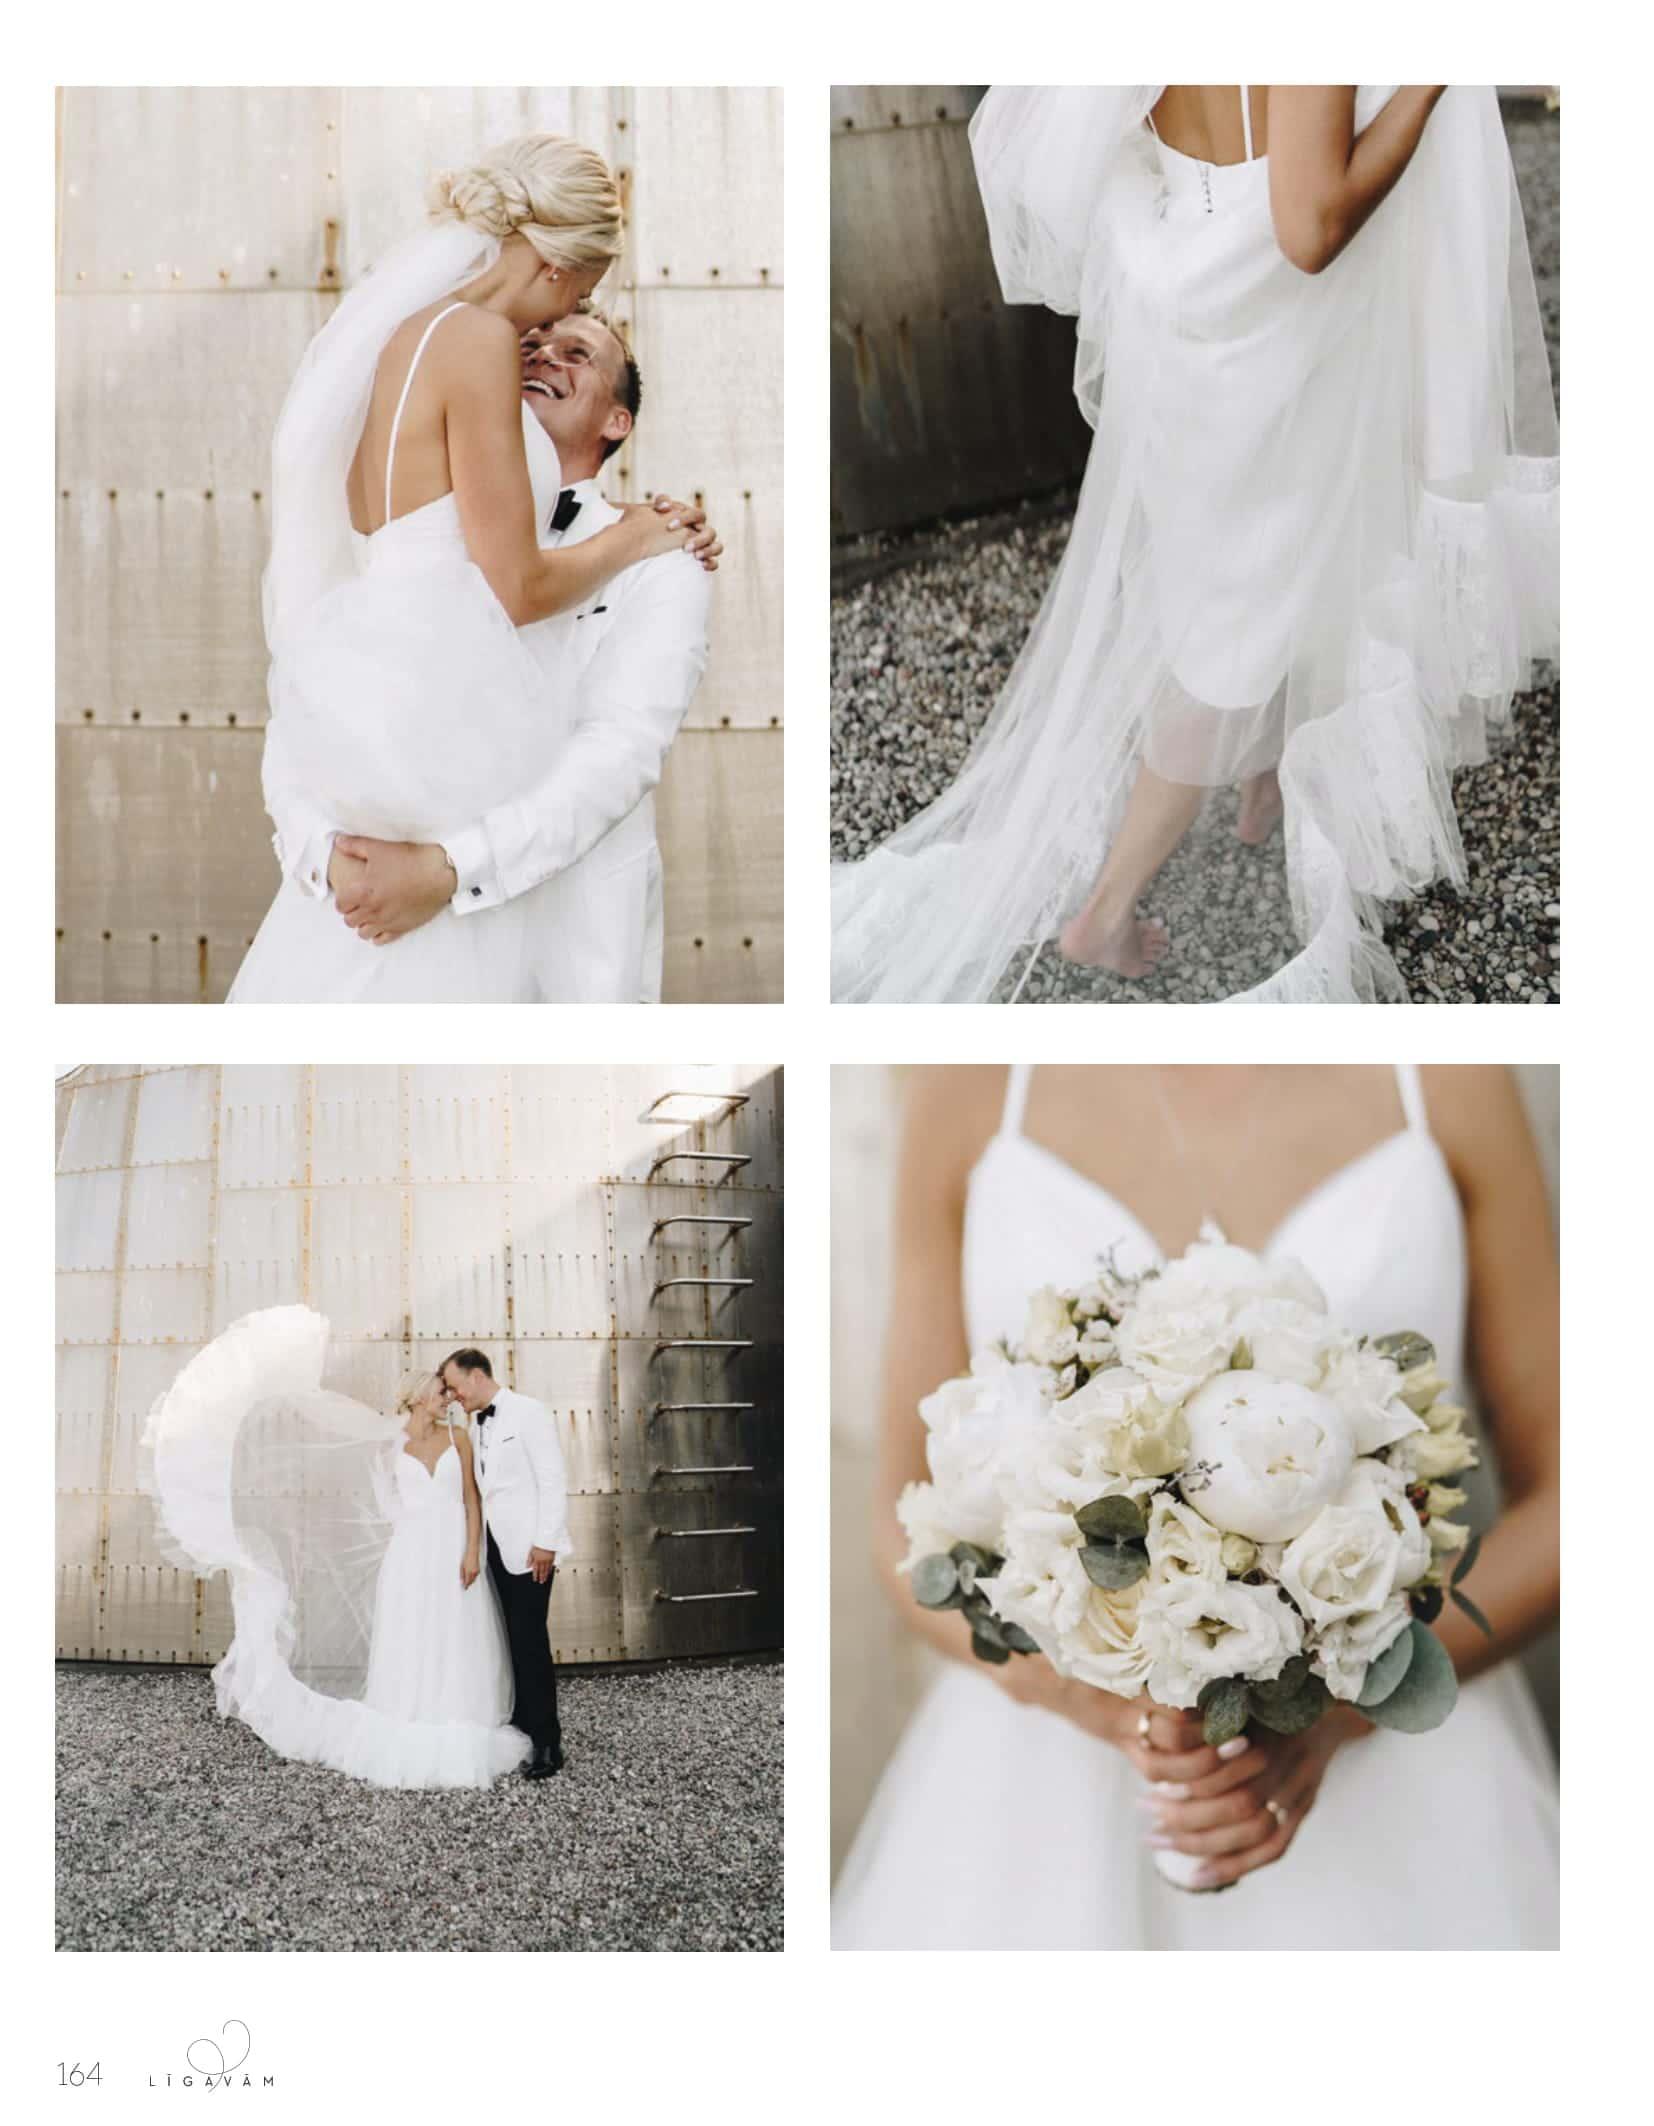 Wedding of Leperi and Martins Kapzems with his beloved Julija in LĪGAVĀM Magazine / Amelii dresses